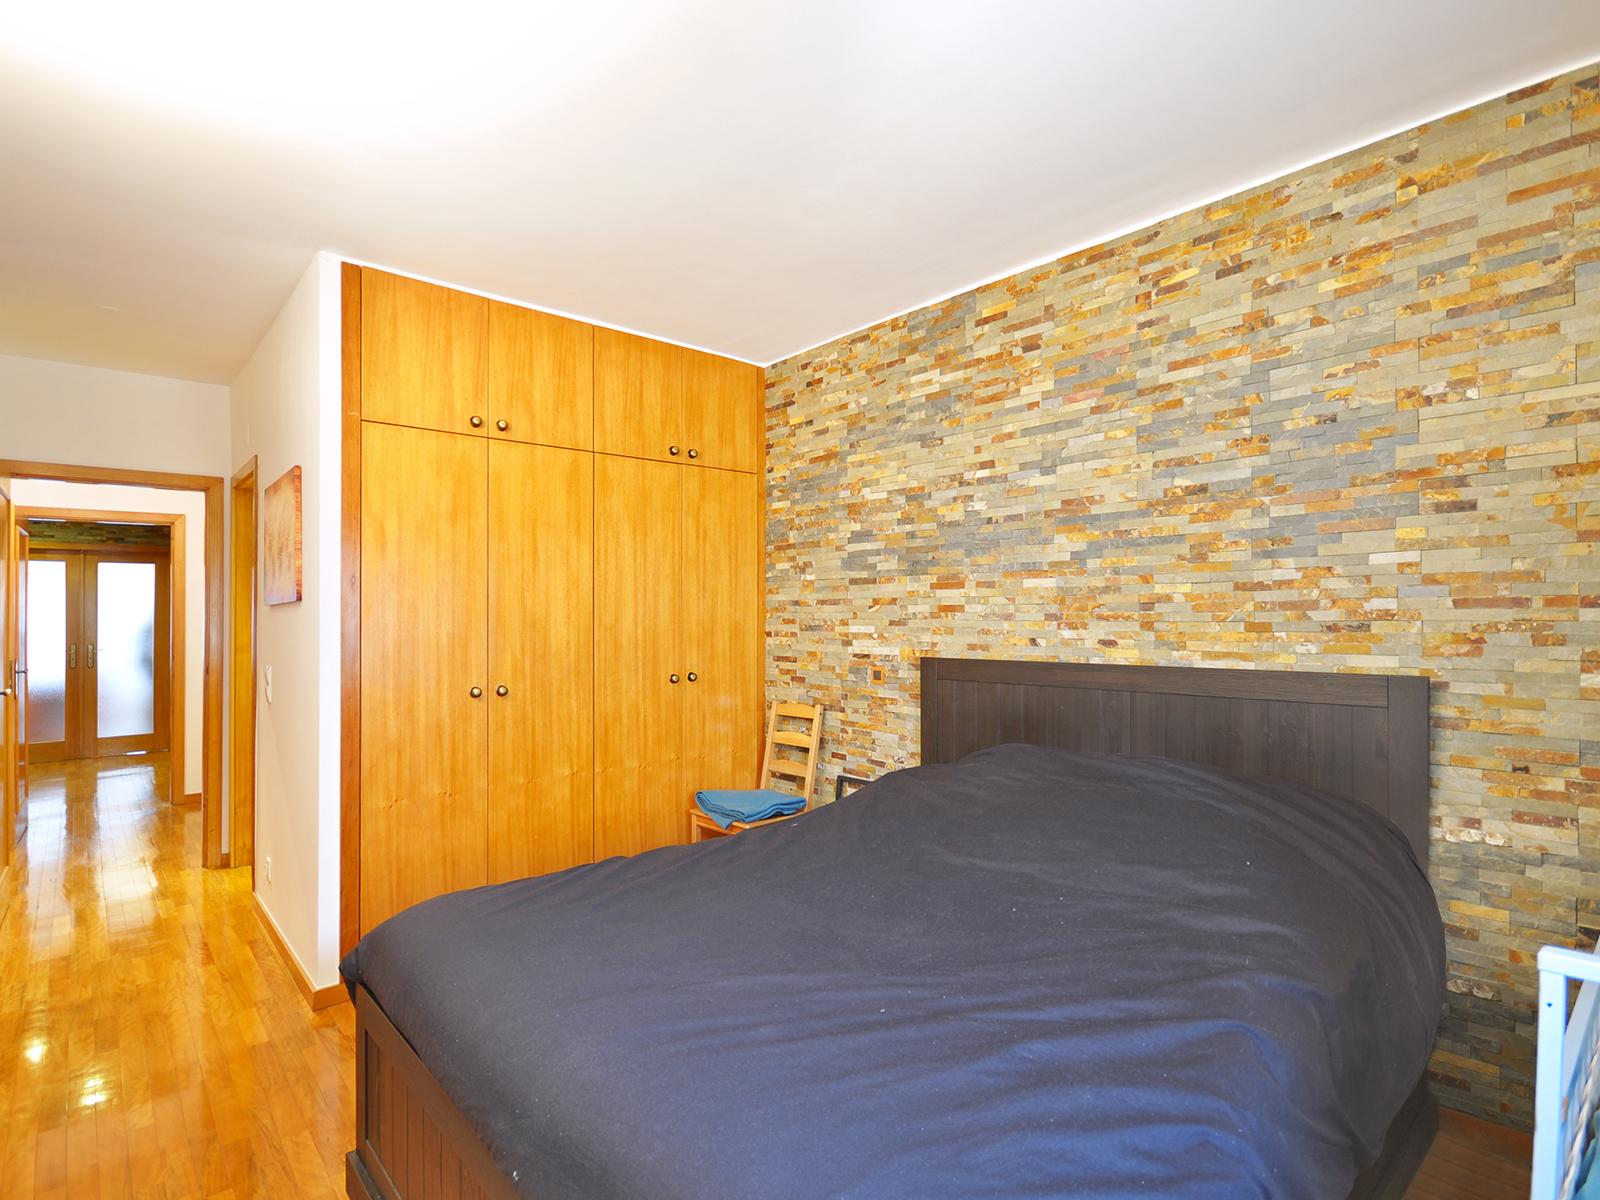 2 bedroom apartment next to the Jardim d'Arca d'Água